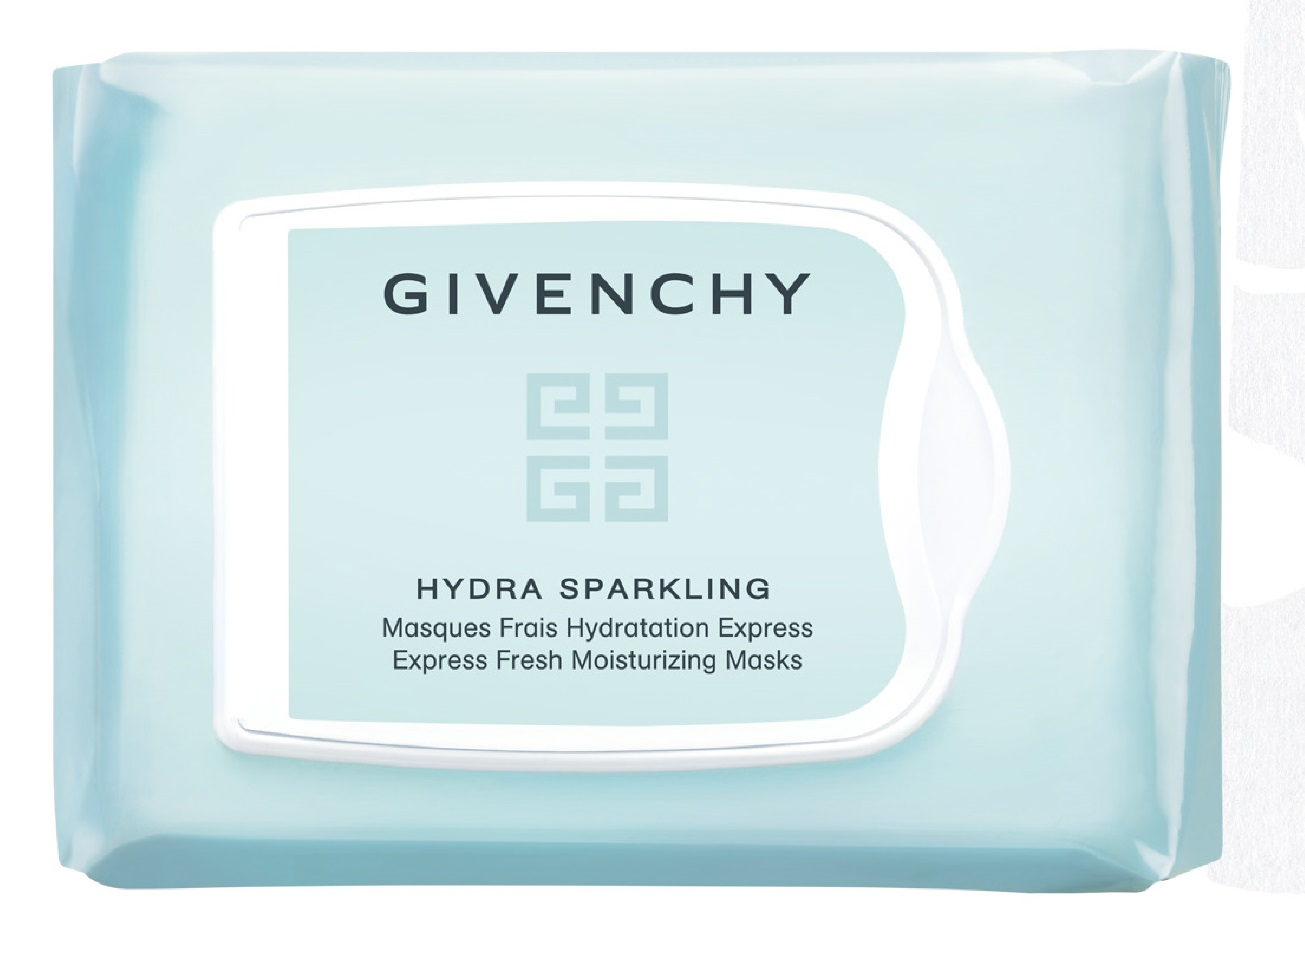 hydra sparkling